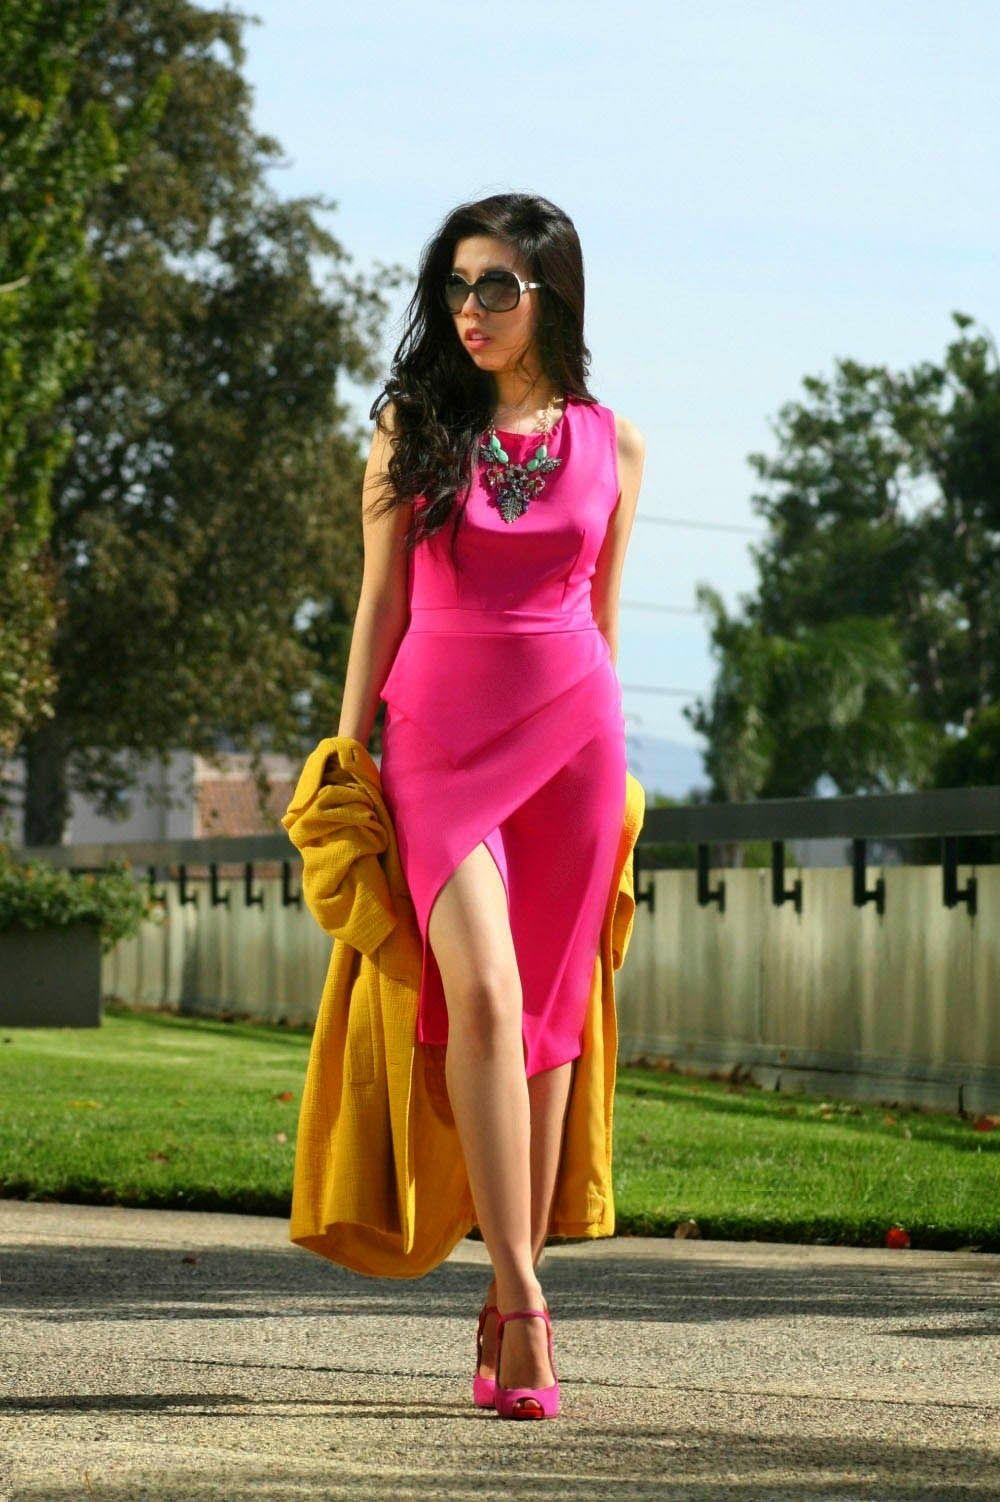 4004f6b7e66 invictus  Mens Rea - Asymmetrial Hot Pink Slit Dress